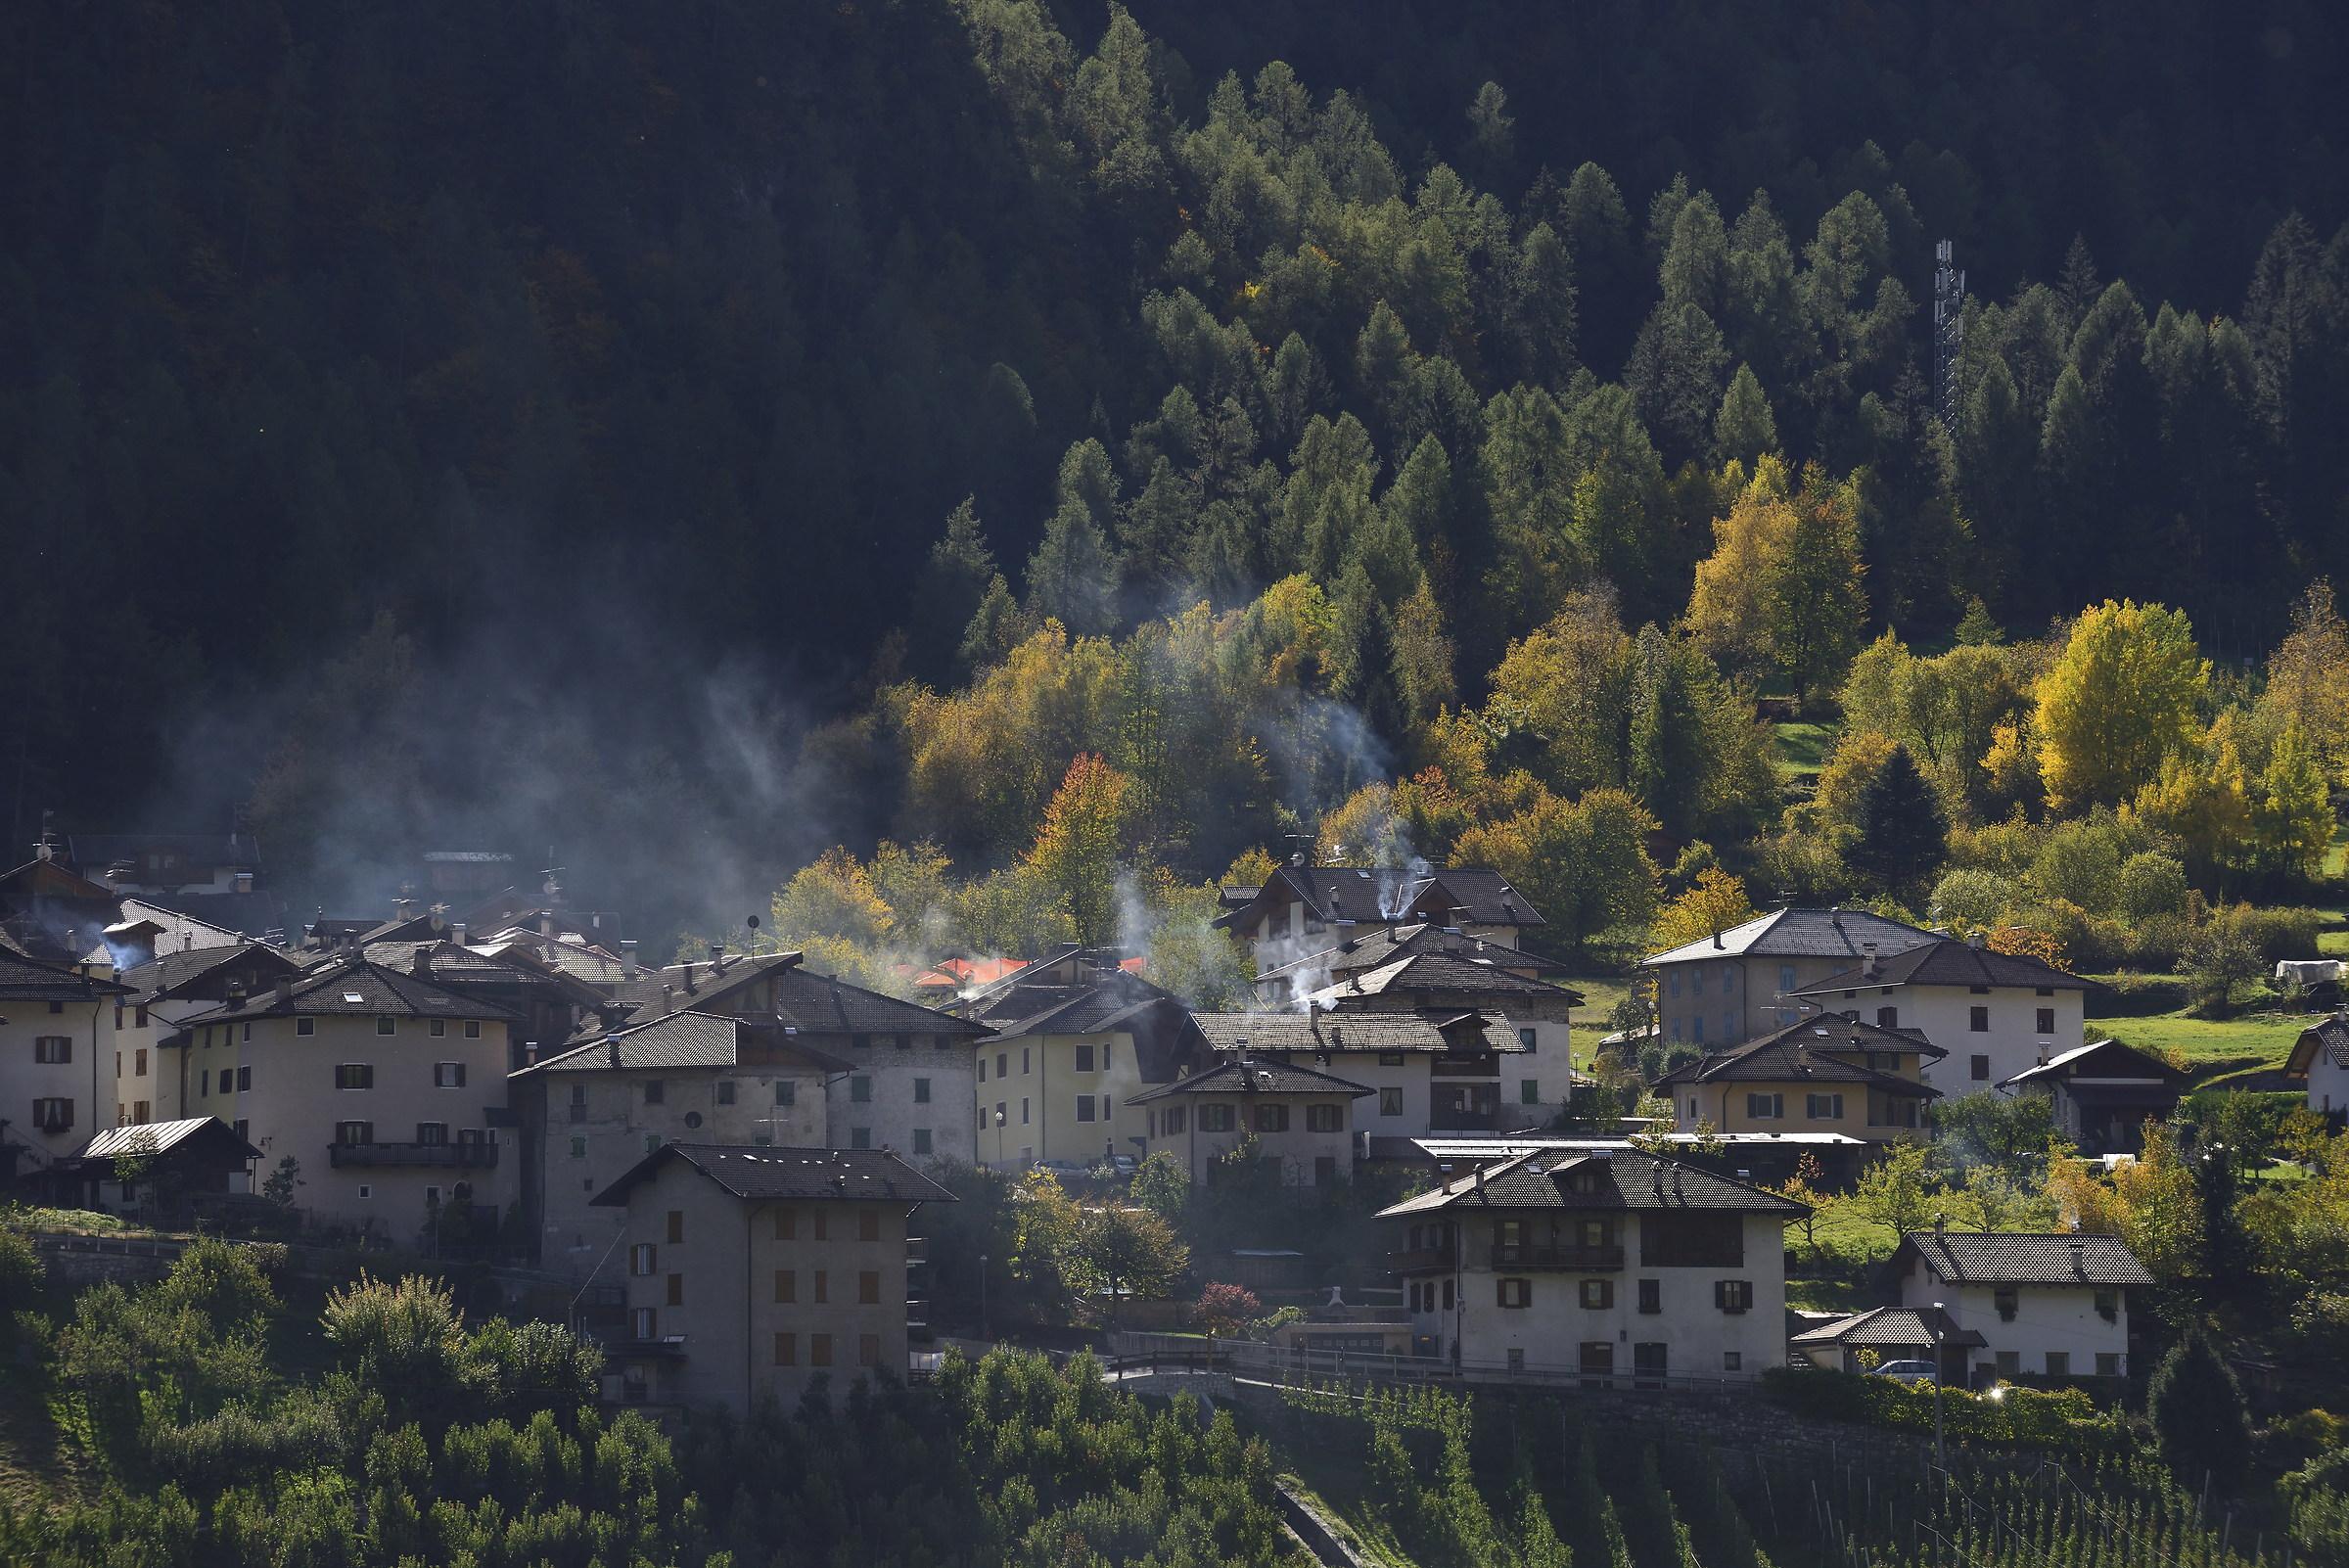 Autumnal chimneys...